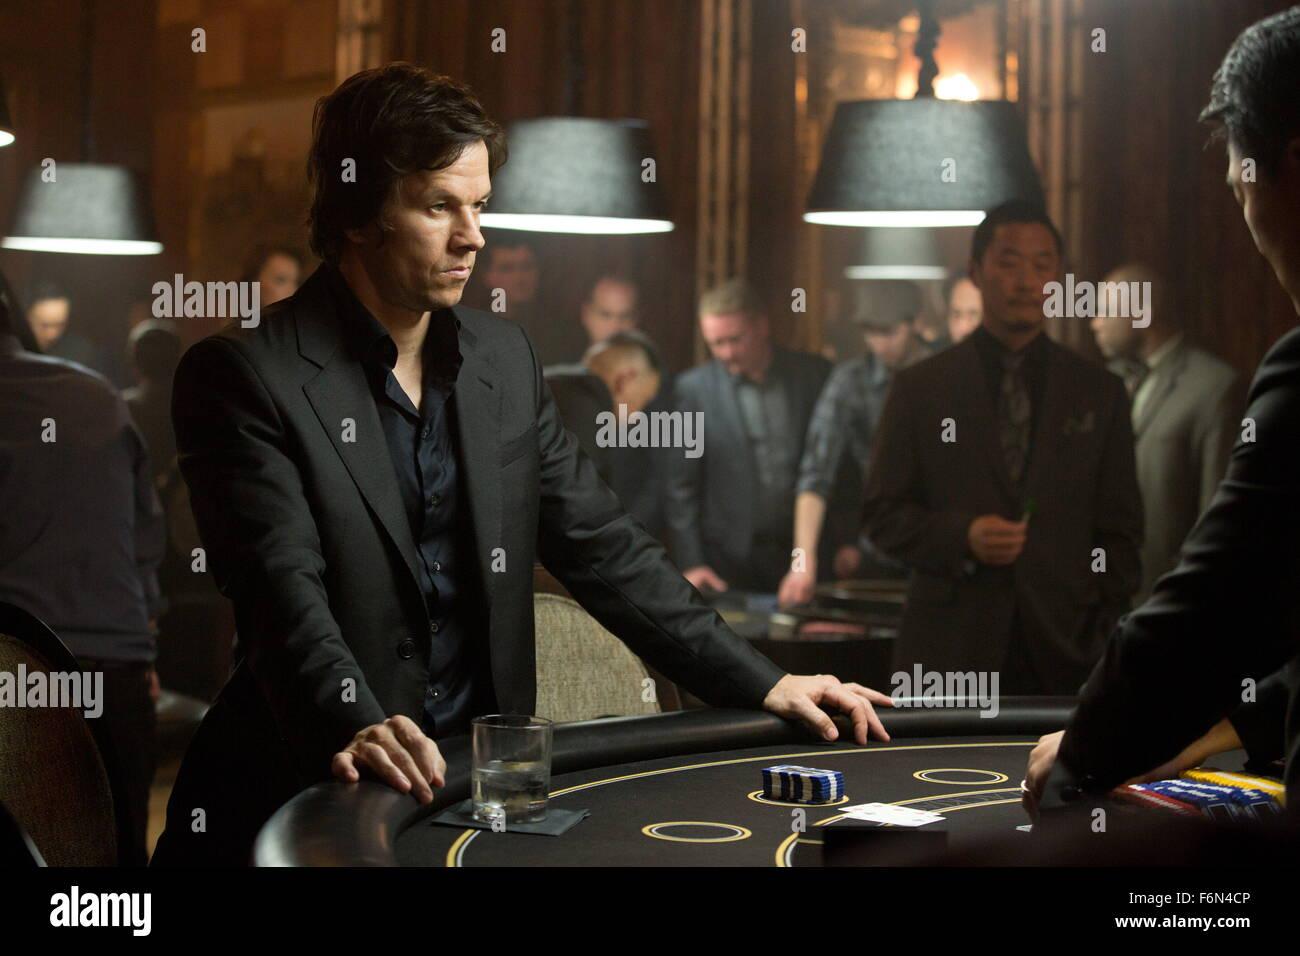 Dating a gambler